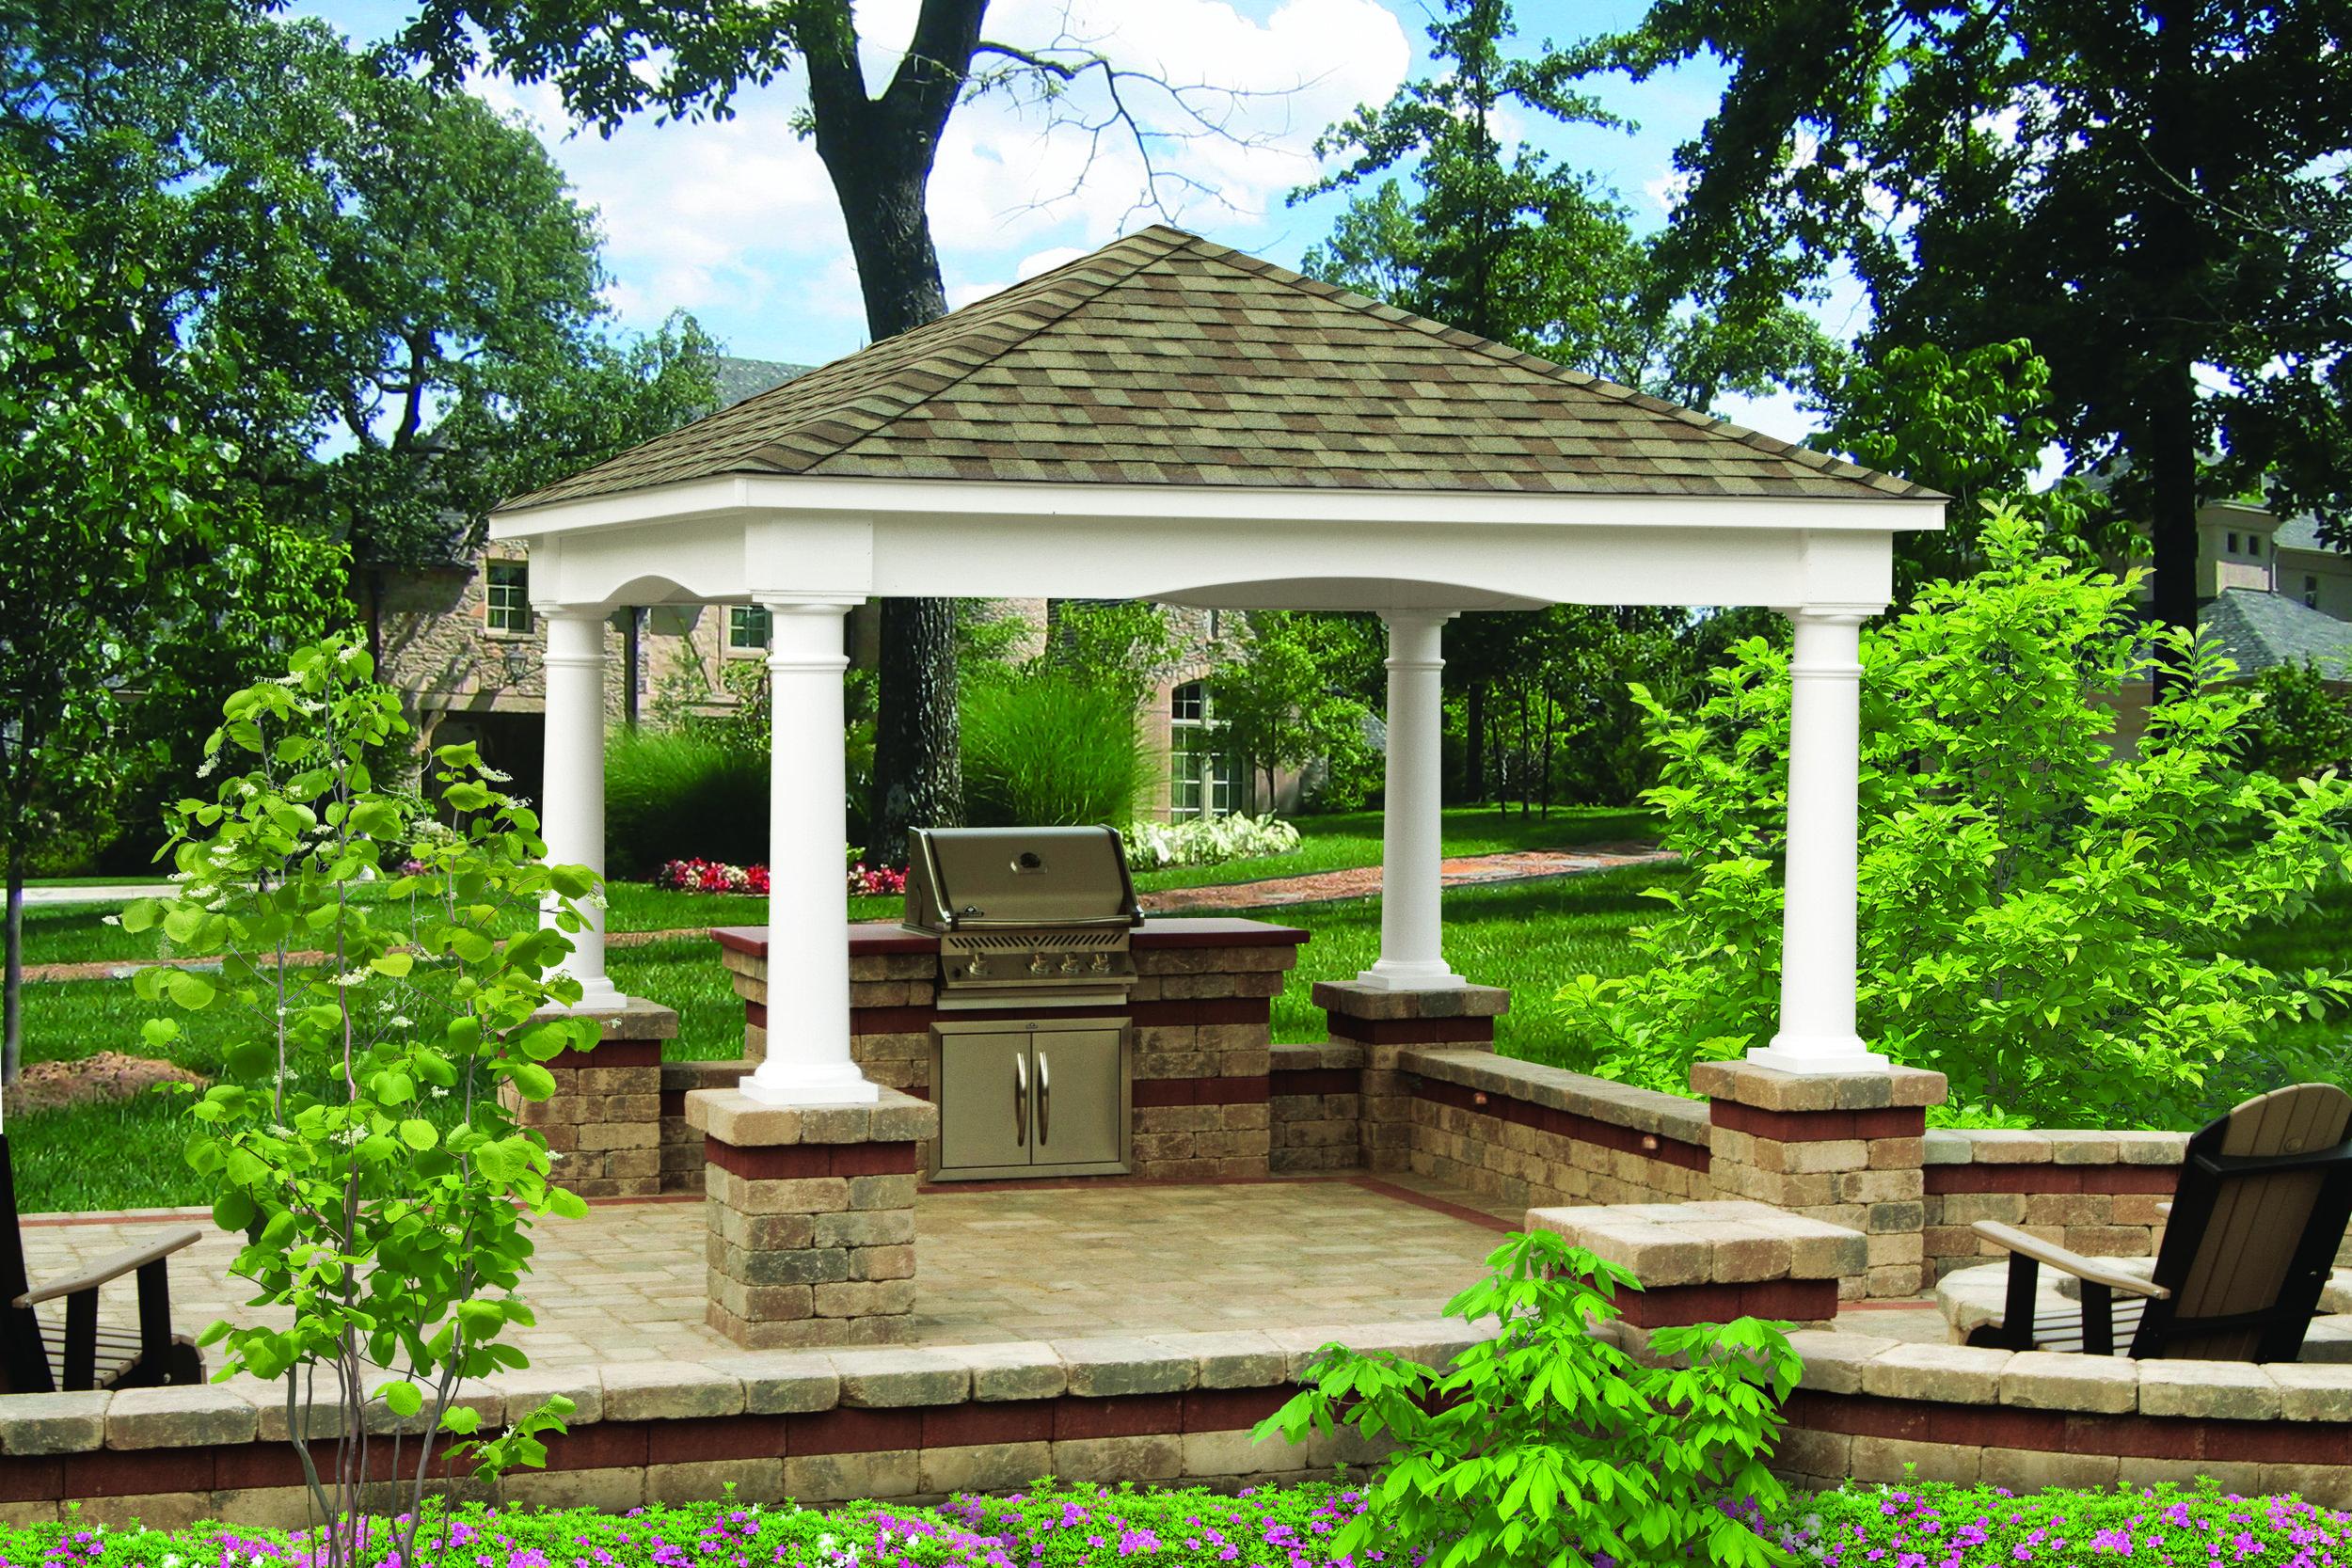 12x12 Victoria Pavilion Regular Roof.jpg